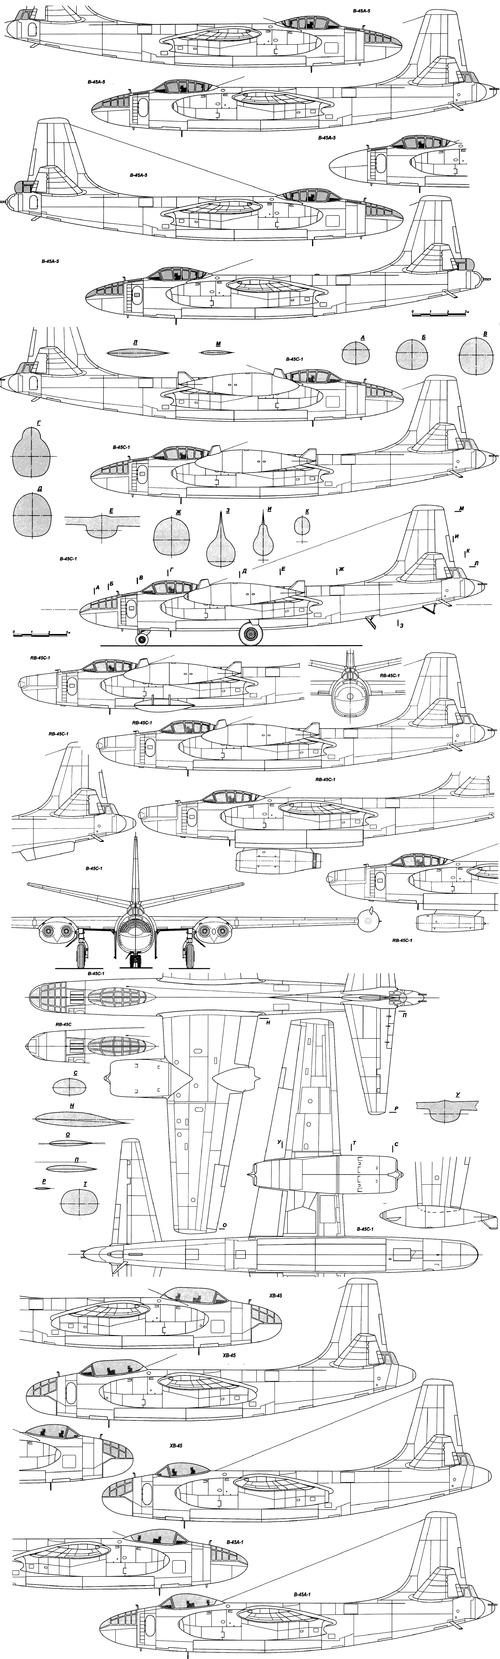 North American B-45 Tornado